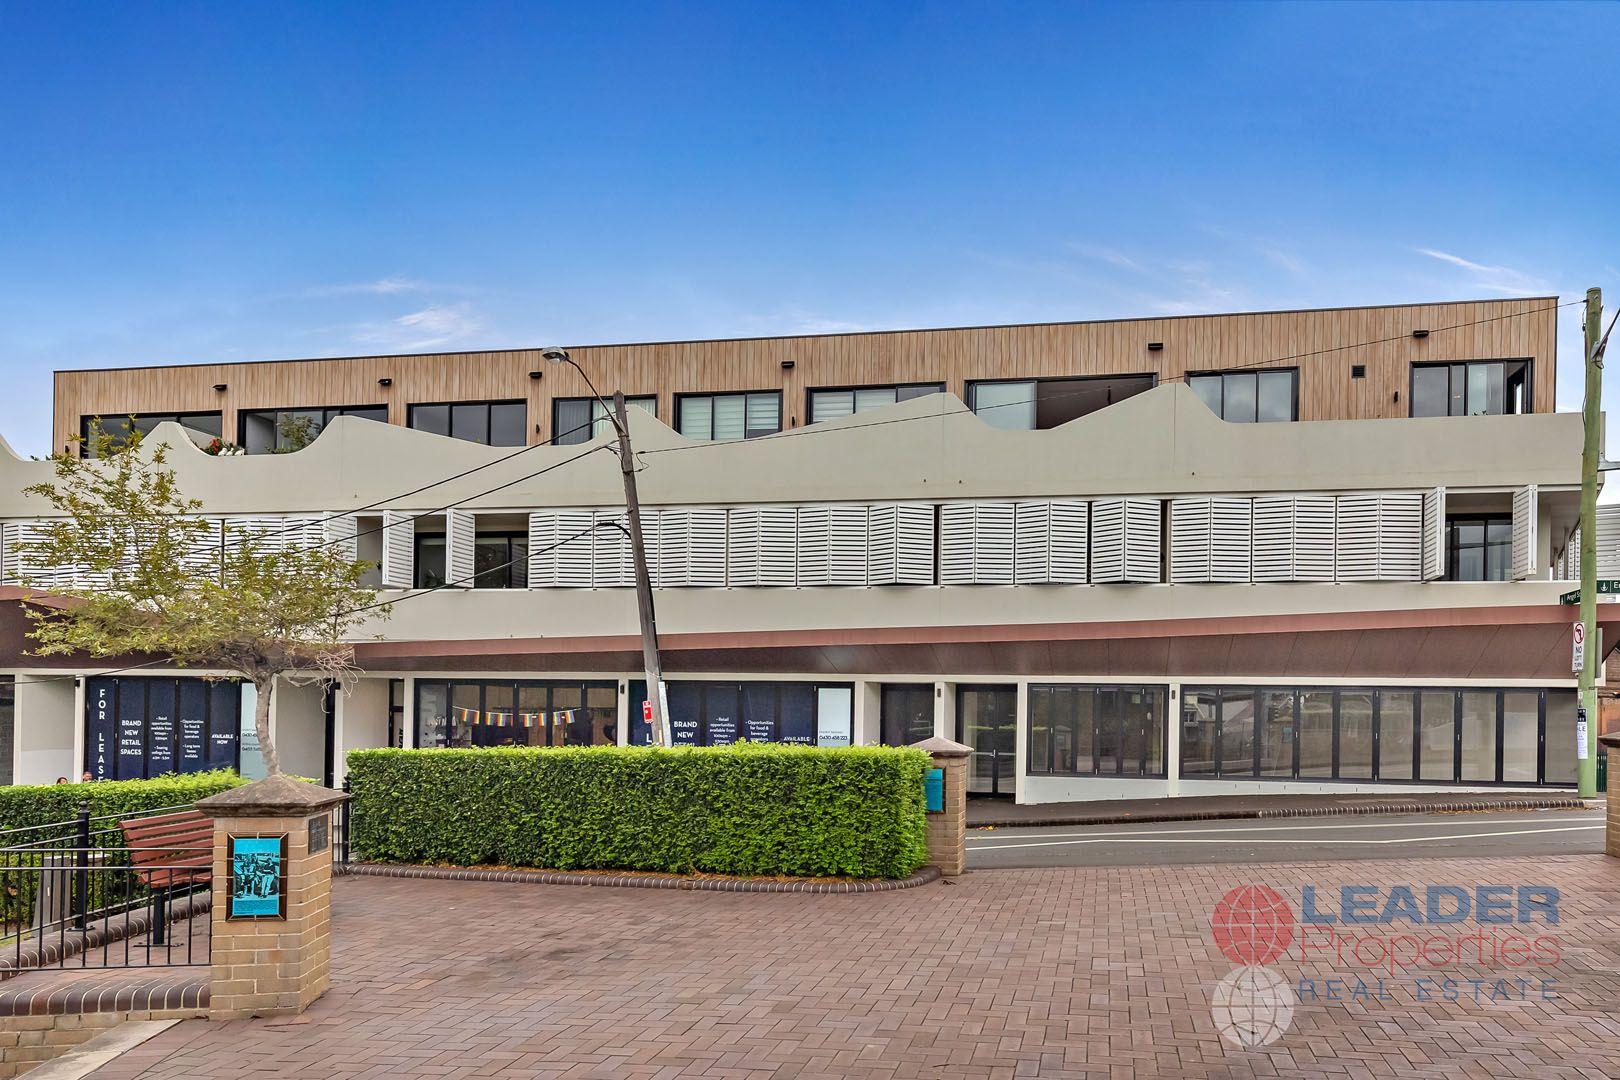 14/15-19 Erskineville  Road, Newtown NSW 2042, Image 0